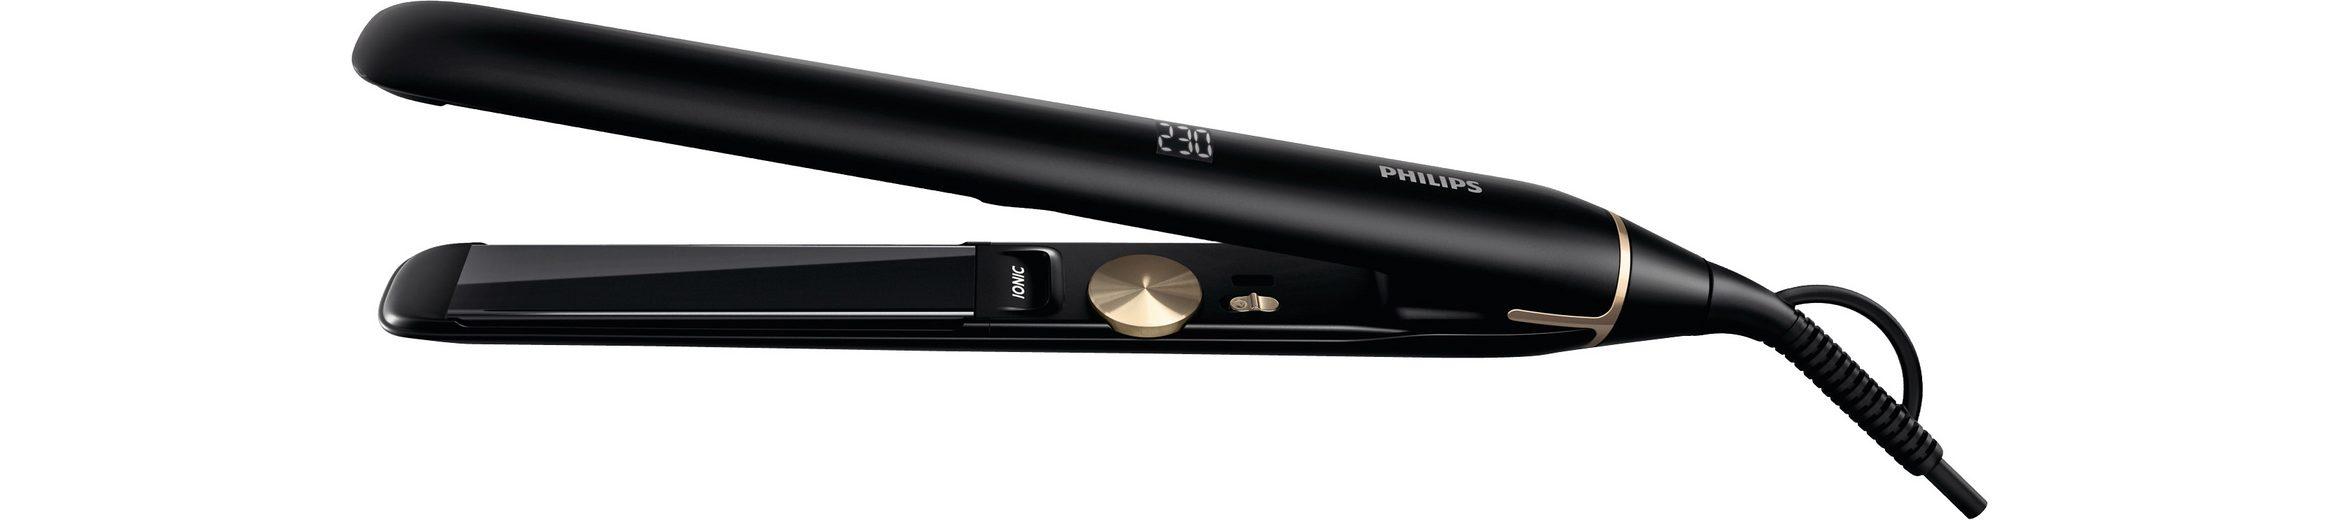 Philips Haarglätter HPS930/00 Pro Serie, Ionenfunktion, Titanbeschichtung